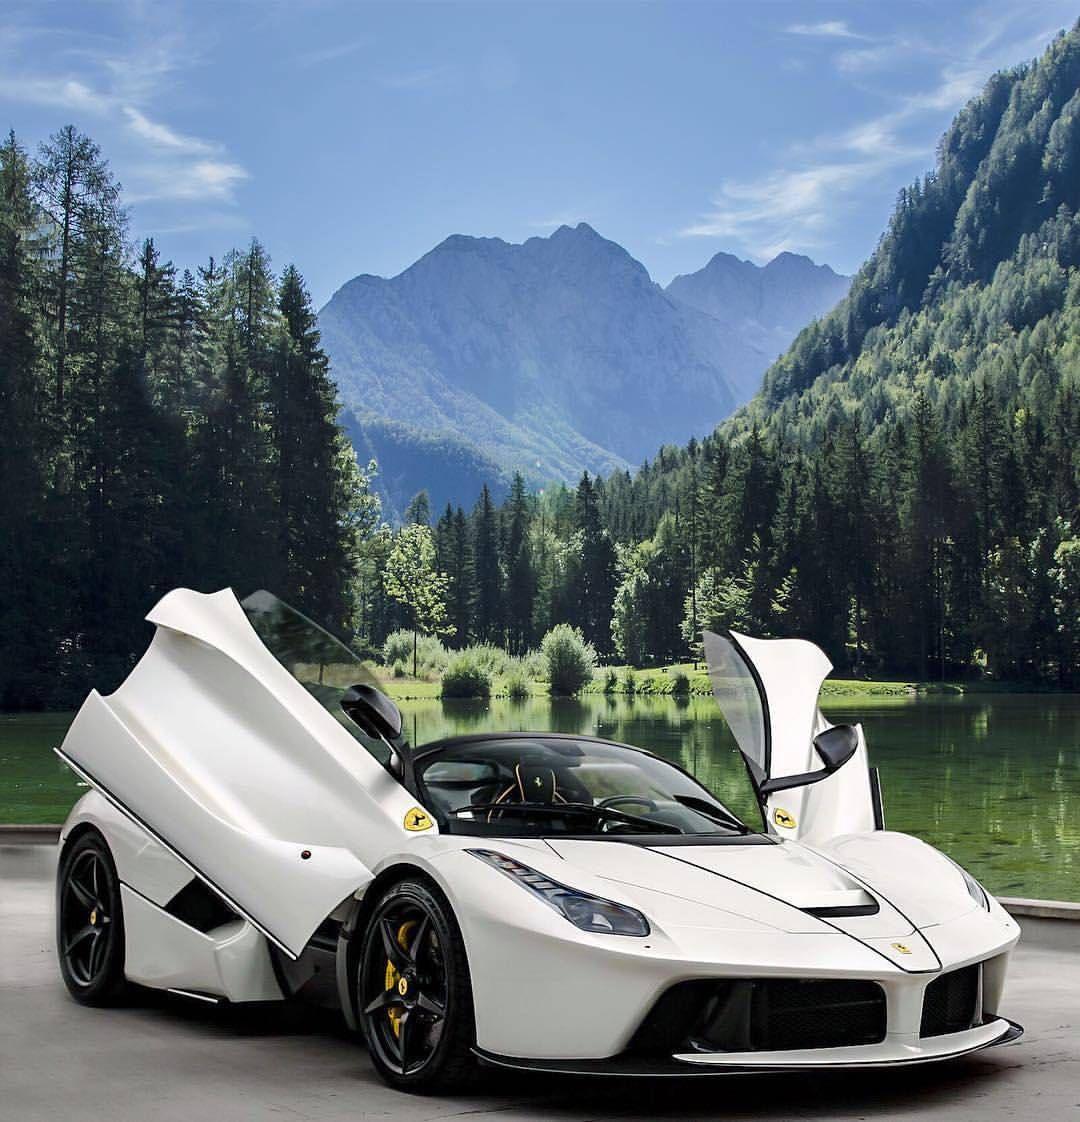 Ferrari Laferrari, Cool Sports